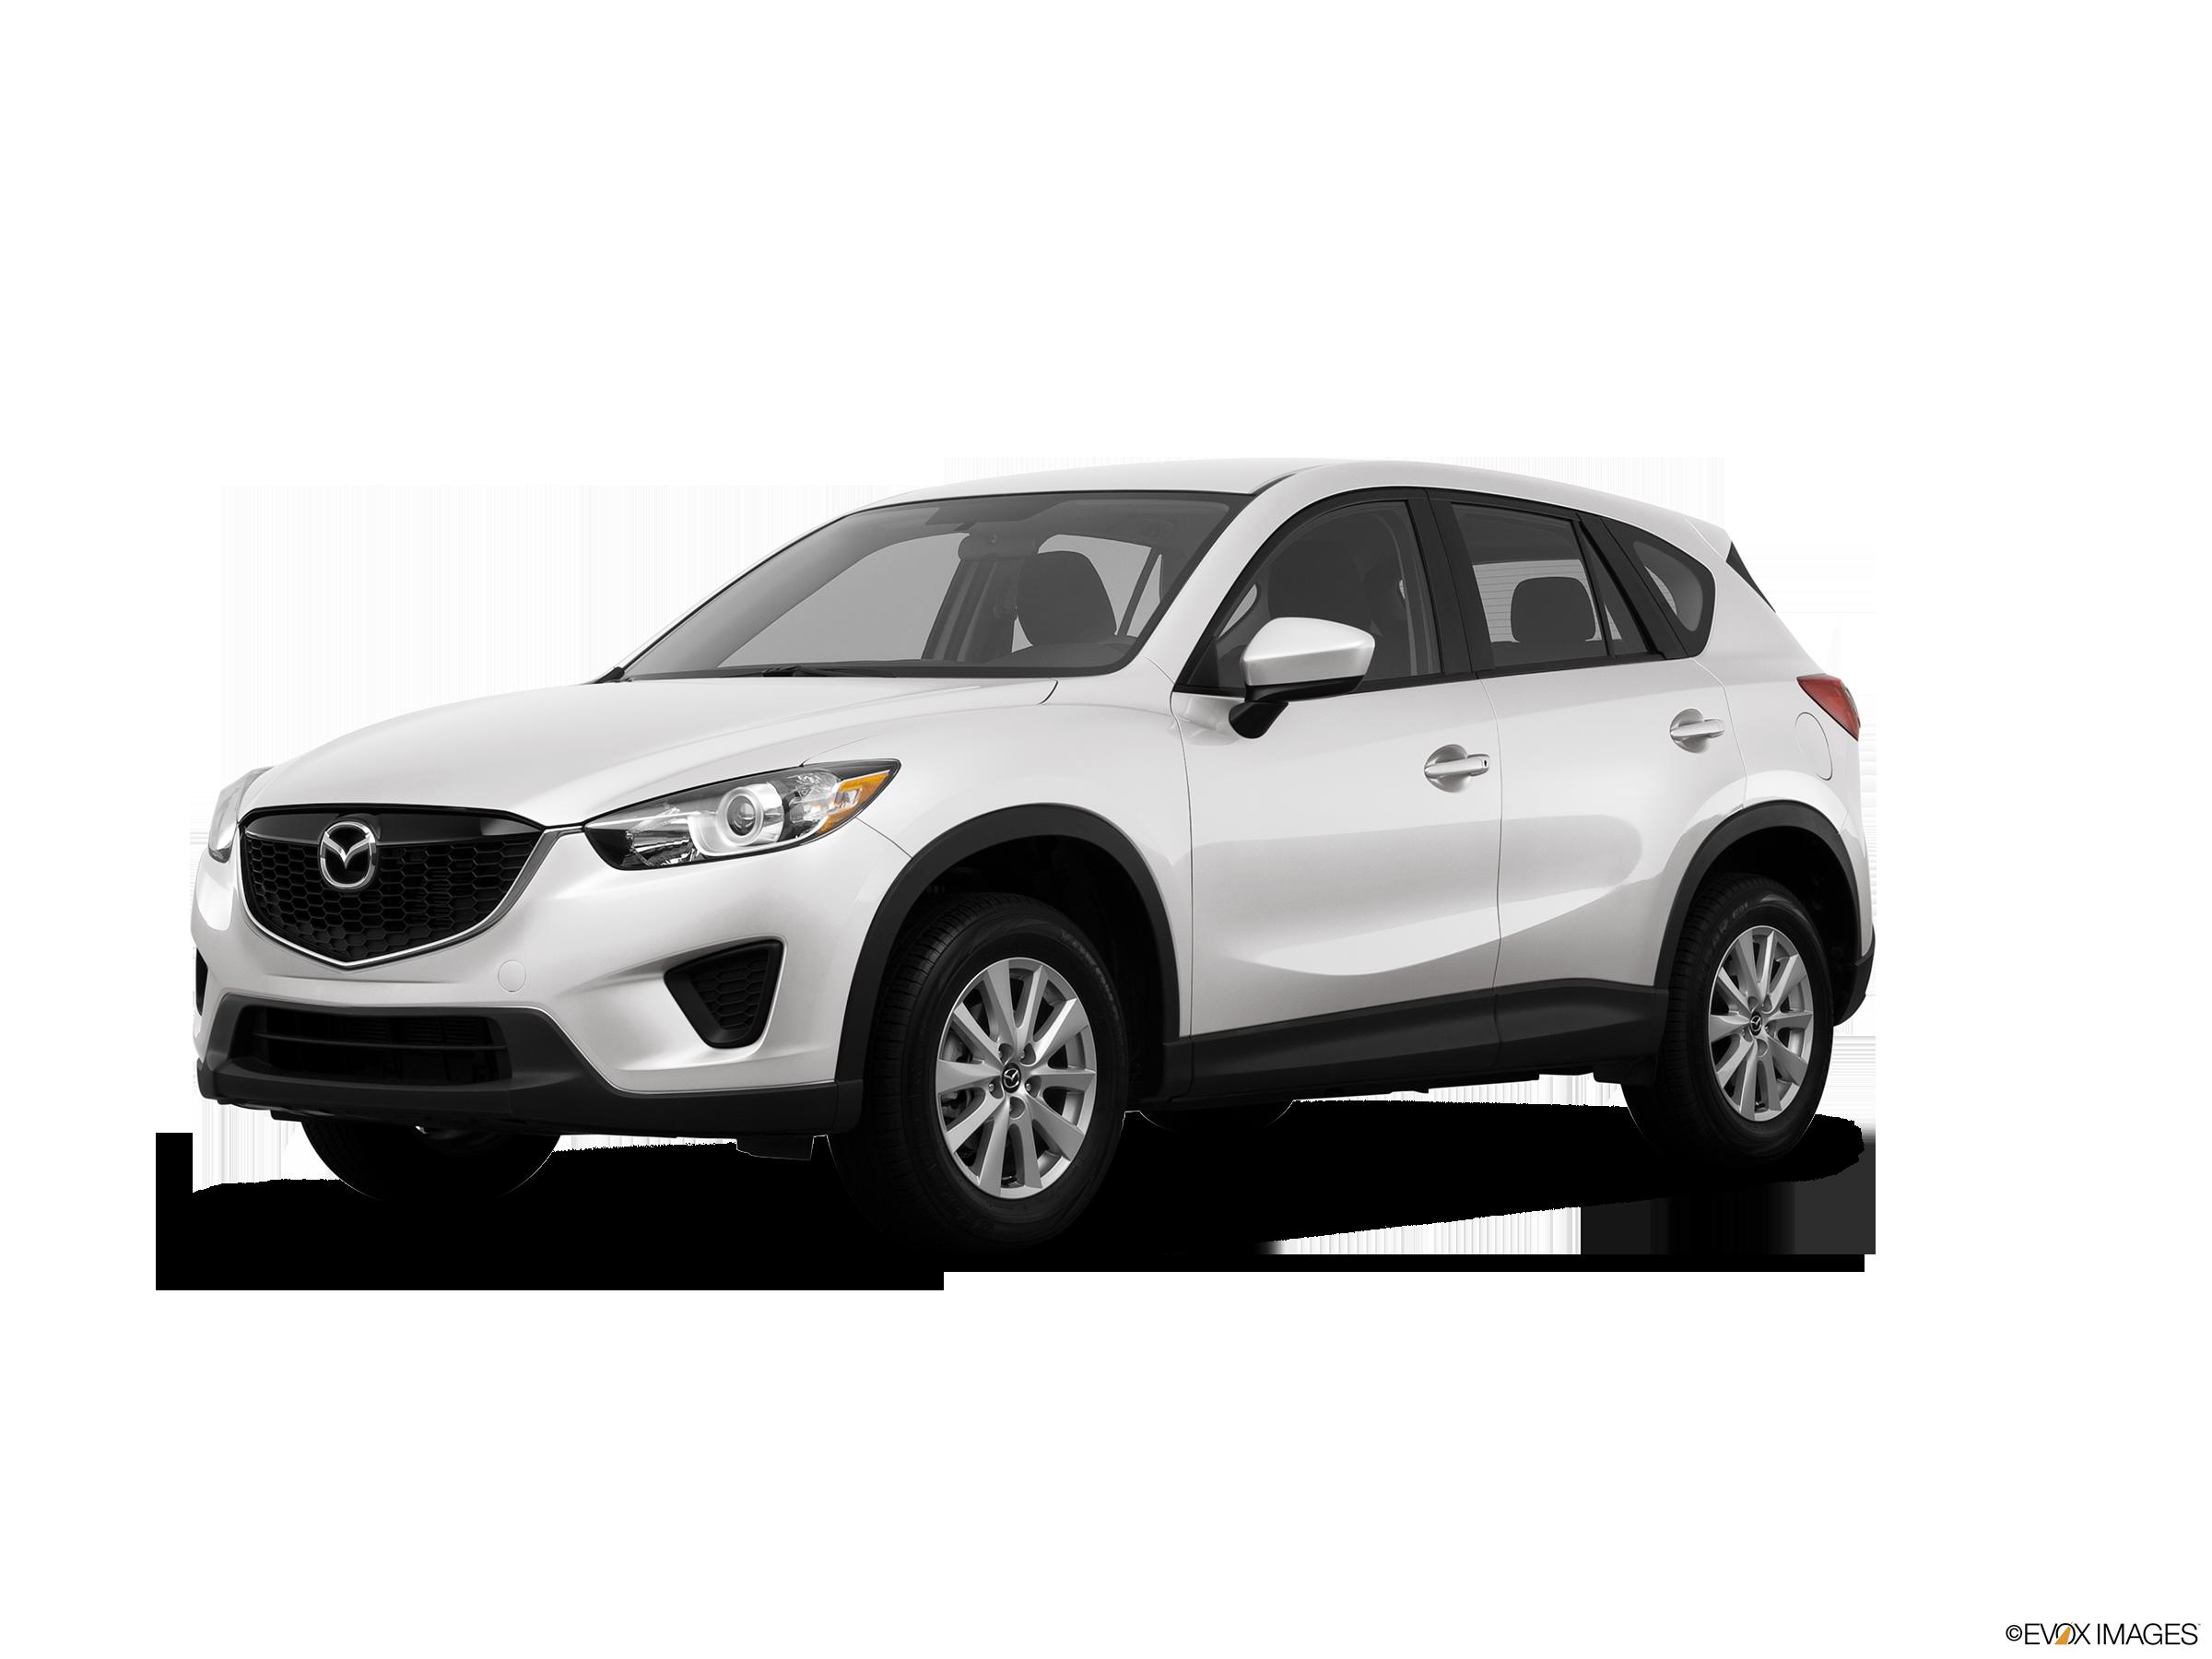 Kelebihan Kekurangan Mazda Cx 5 2013 Murah Berkualitas